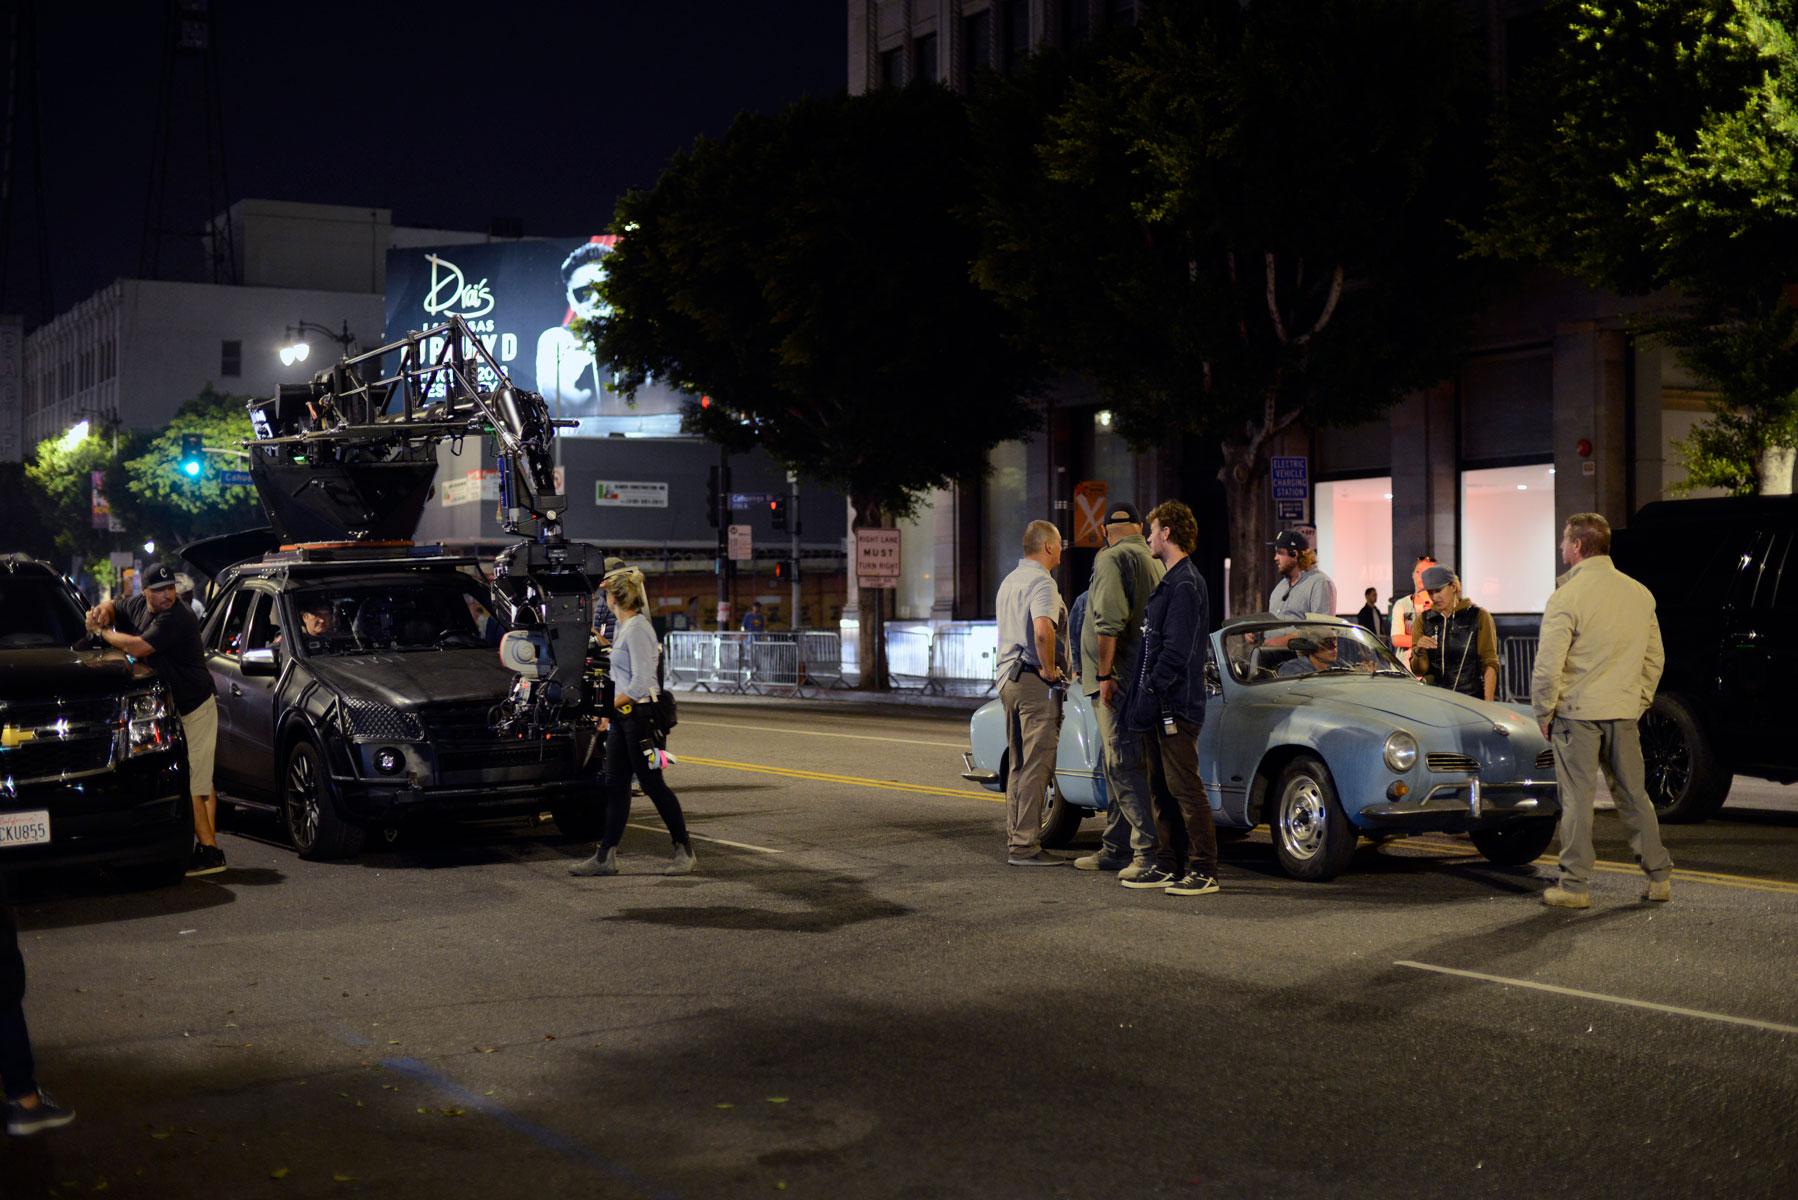 Брэд Питт навинтажном Volkswagen во время съемок